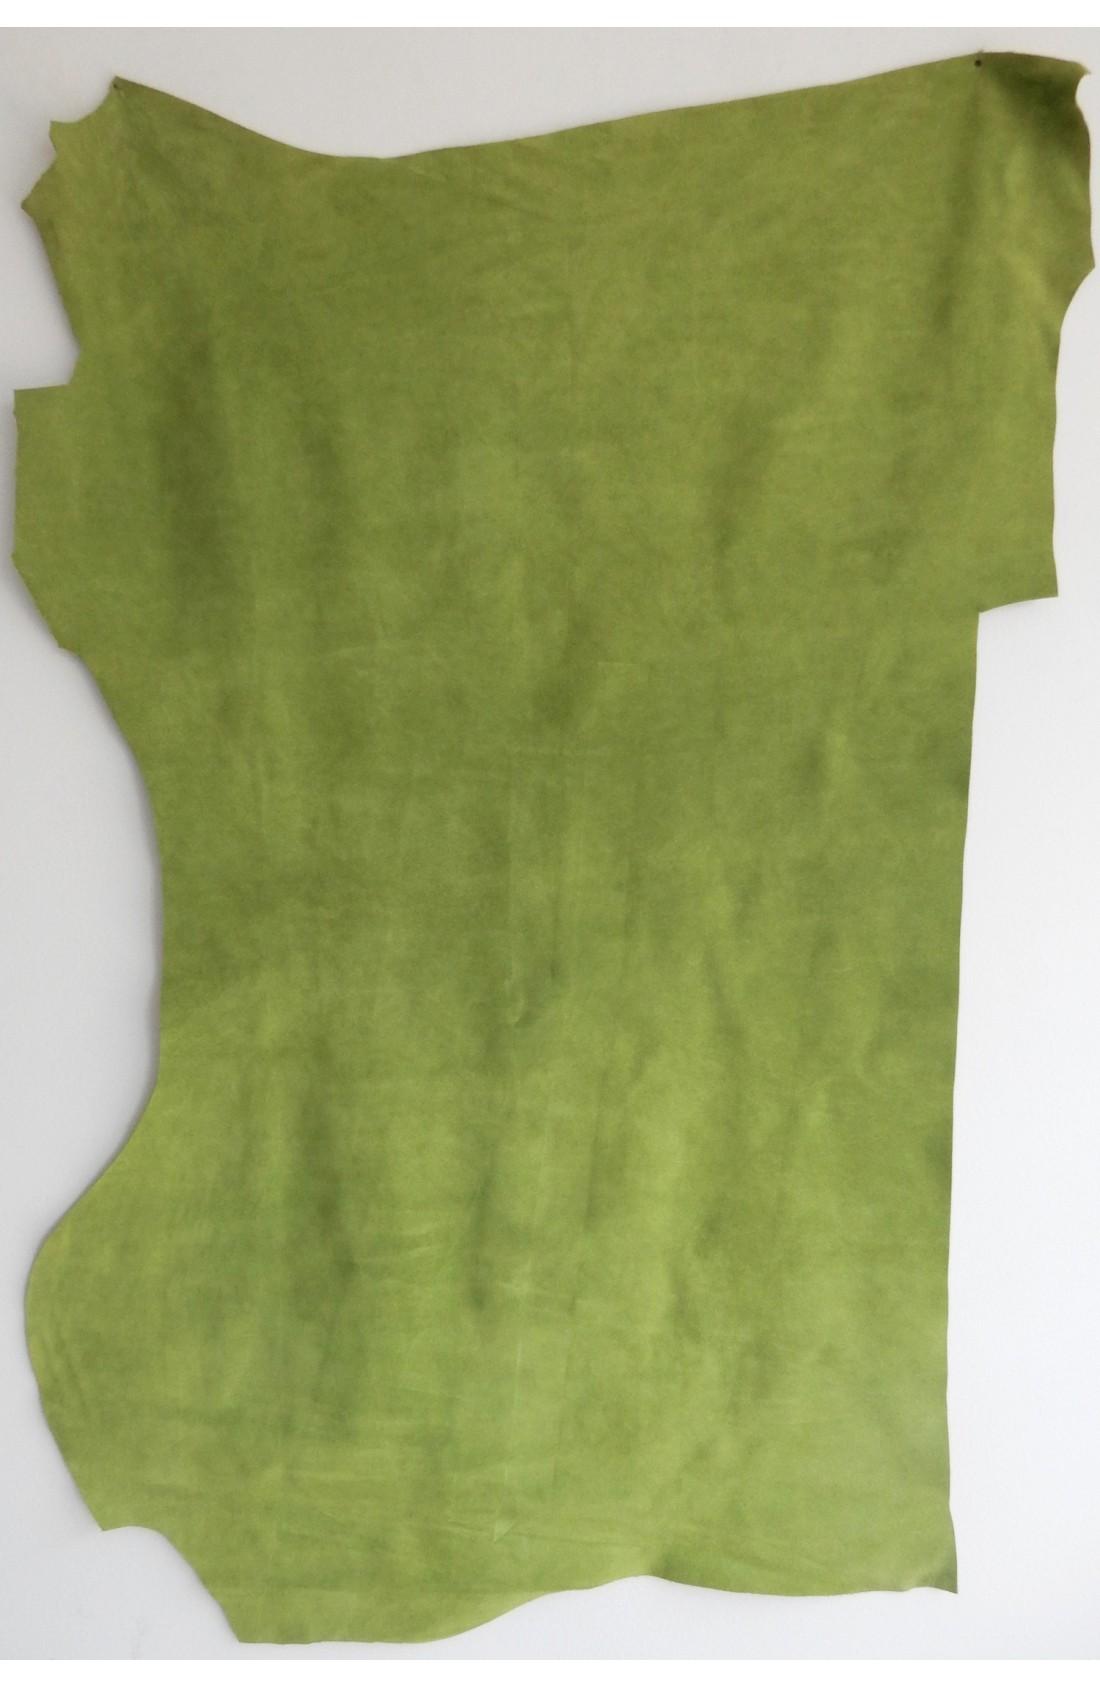 art. 60 SCAMOSCIATO var.63 verde aloe (1)